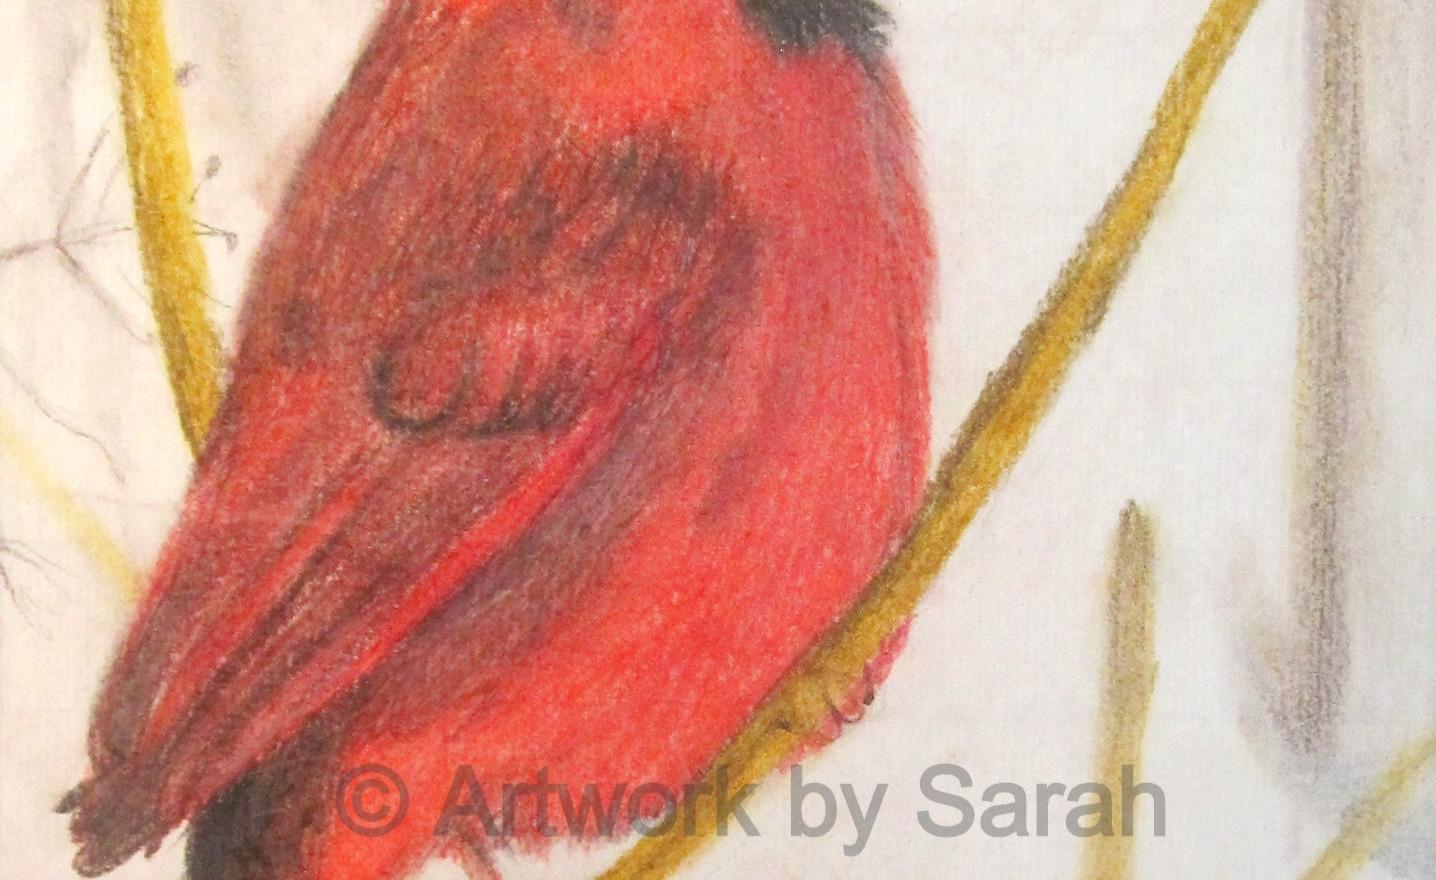 Songbird Collection #4: Northern Cardina